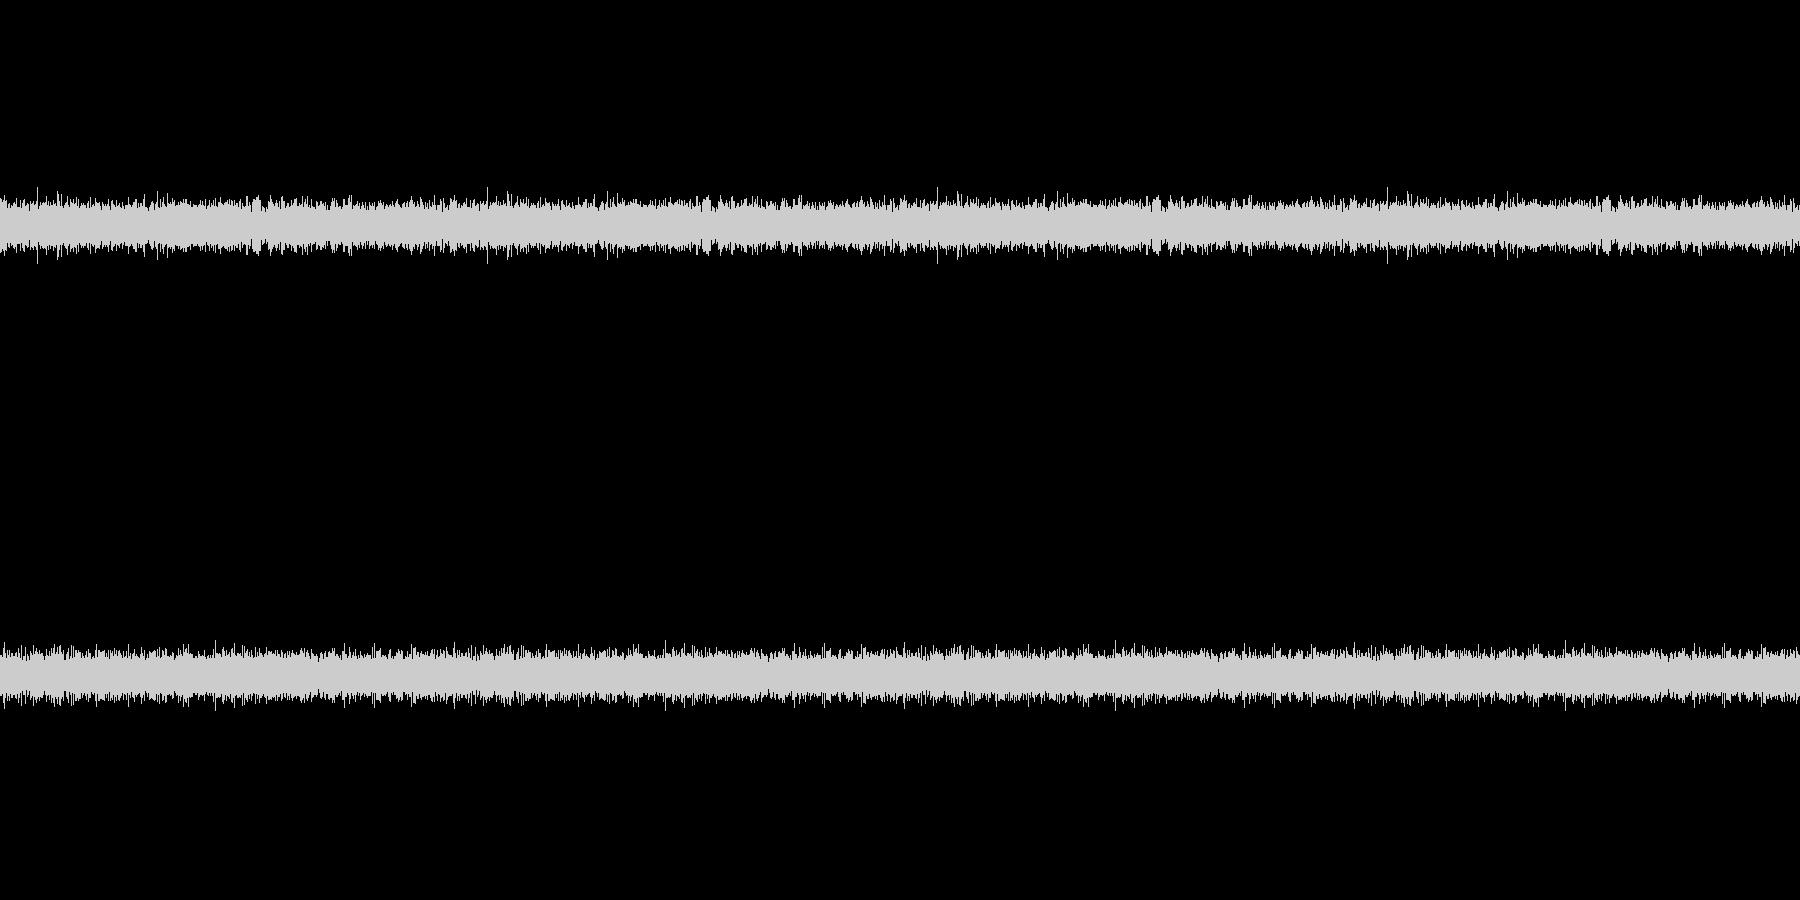 ASMR 音フェチApp用 ノイズ 3の未再生の波形